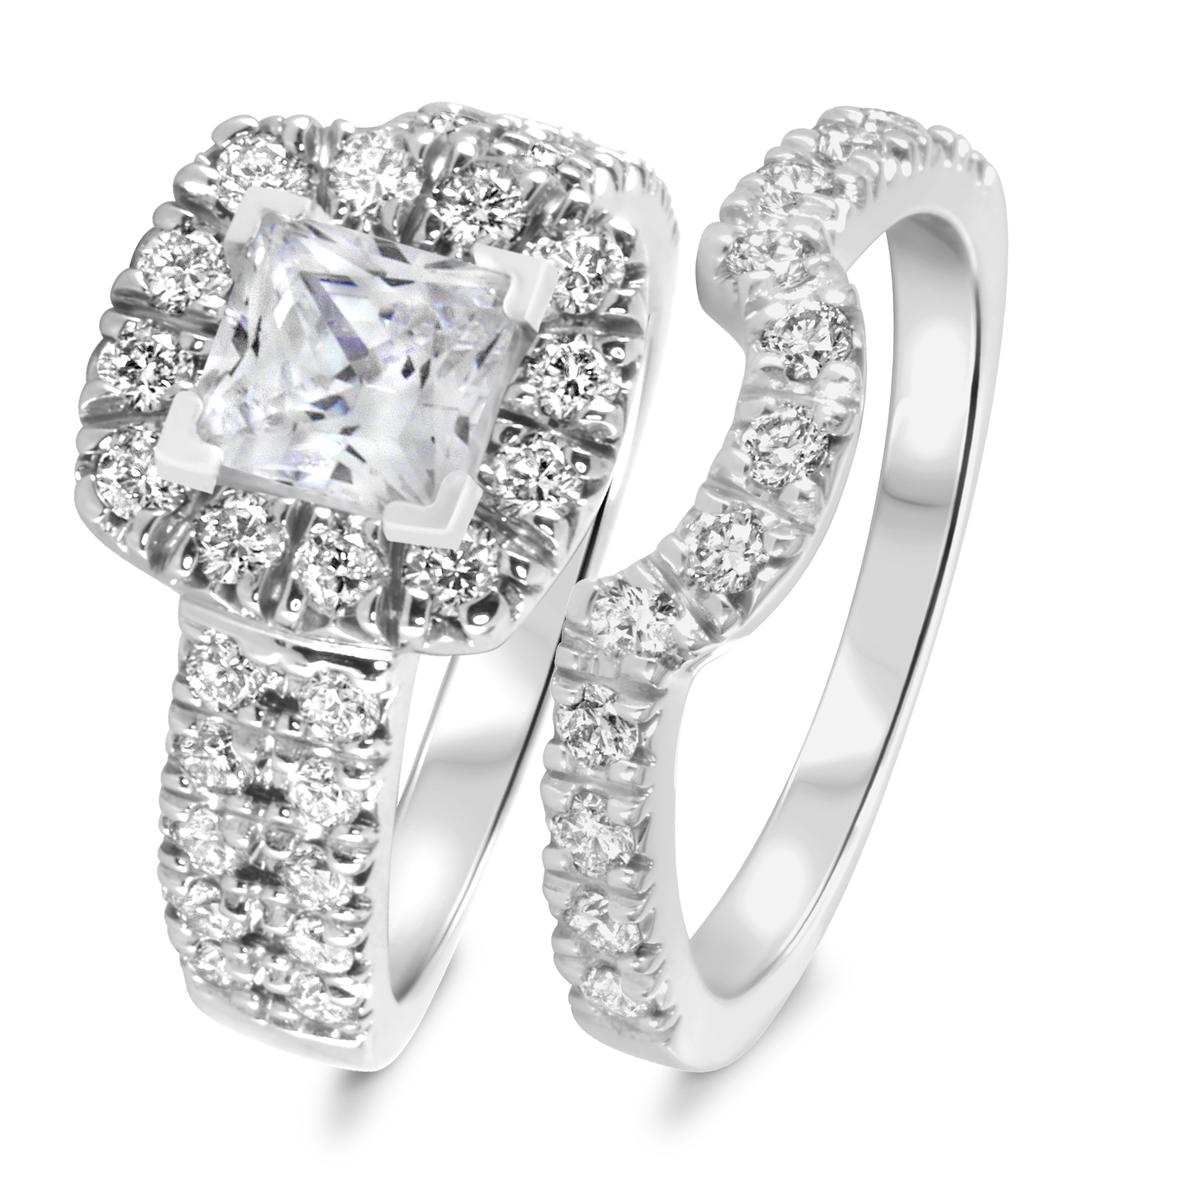 2 1/2 CT. T.W. Diamond Women's Bridal Wedding Ring Set 10K White Gold